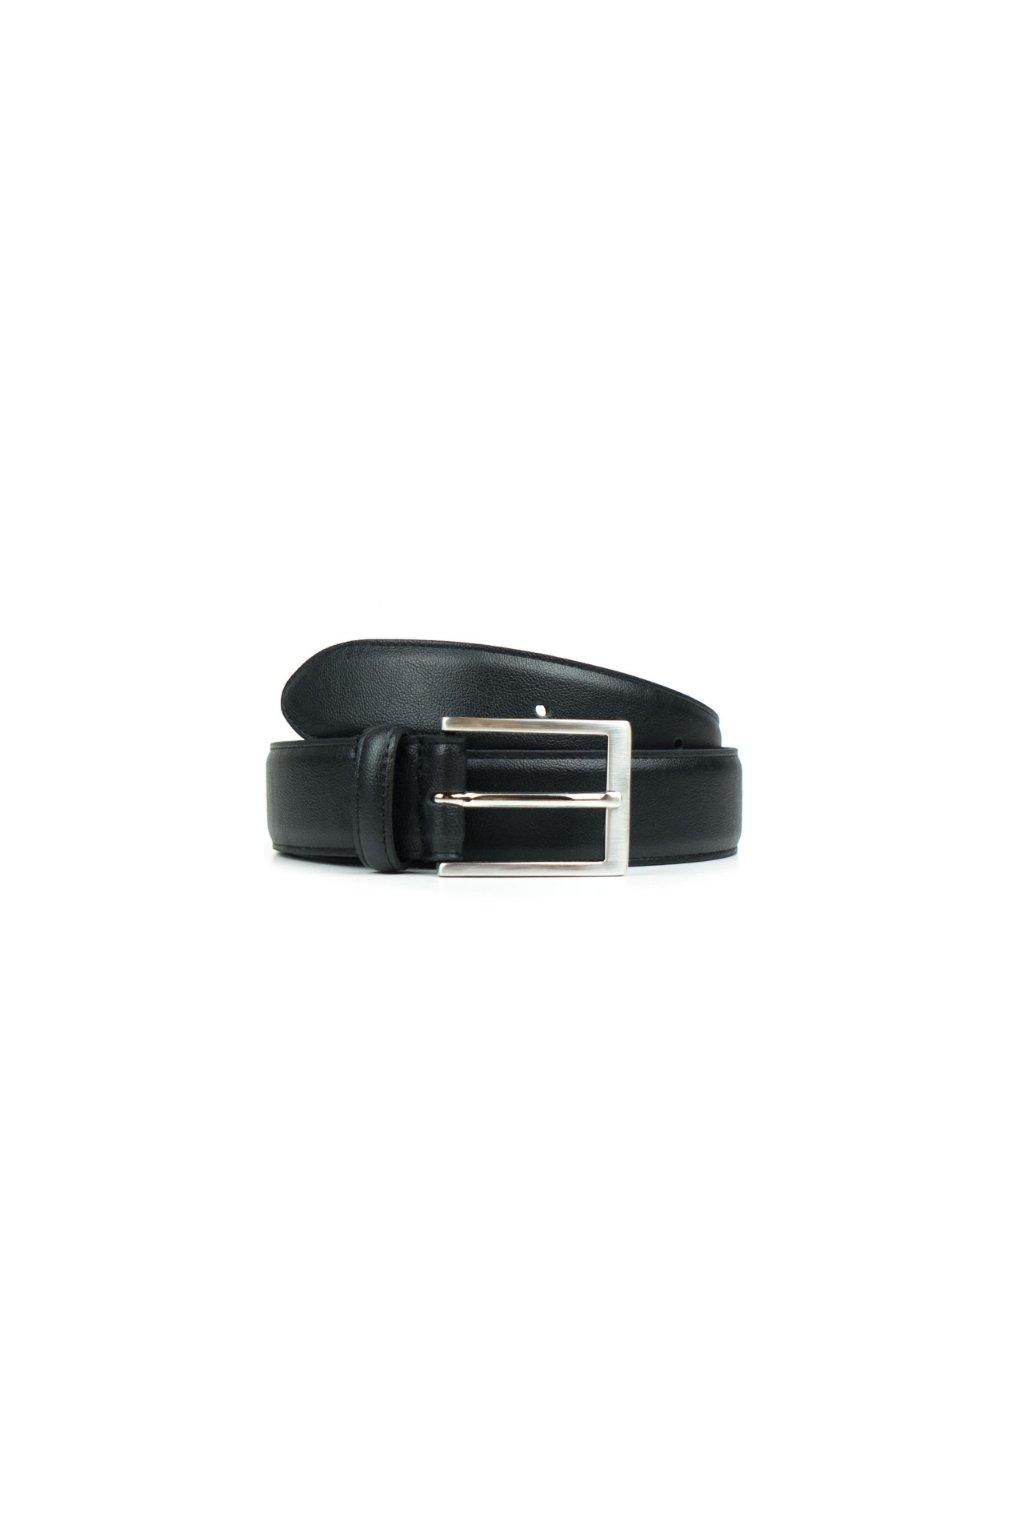 "Čierny opasok "" Classic 3cm Belt Black"""